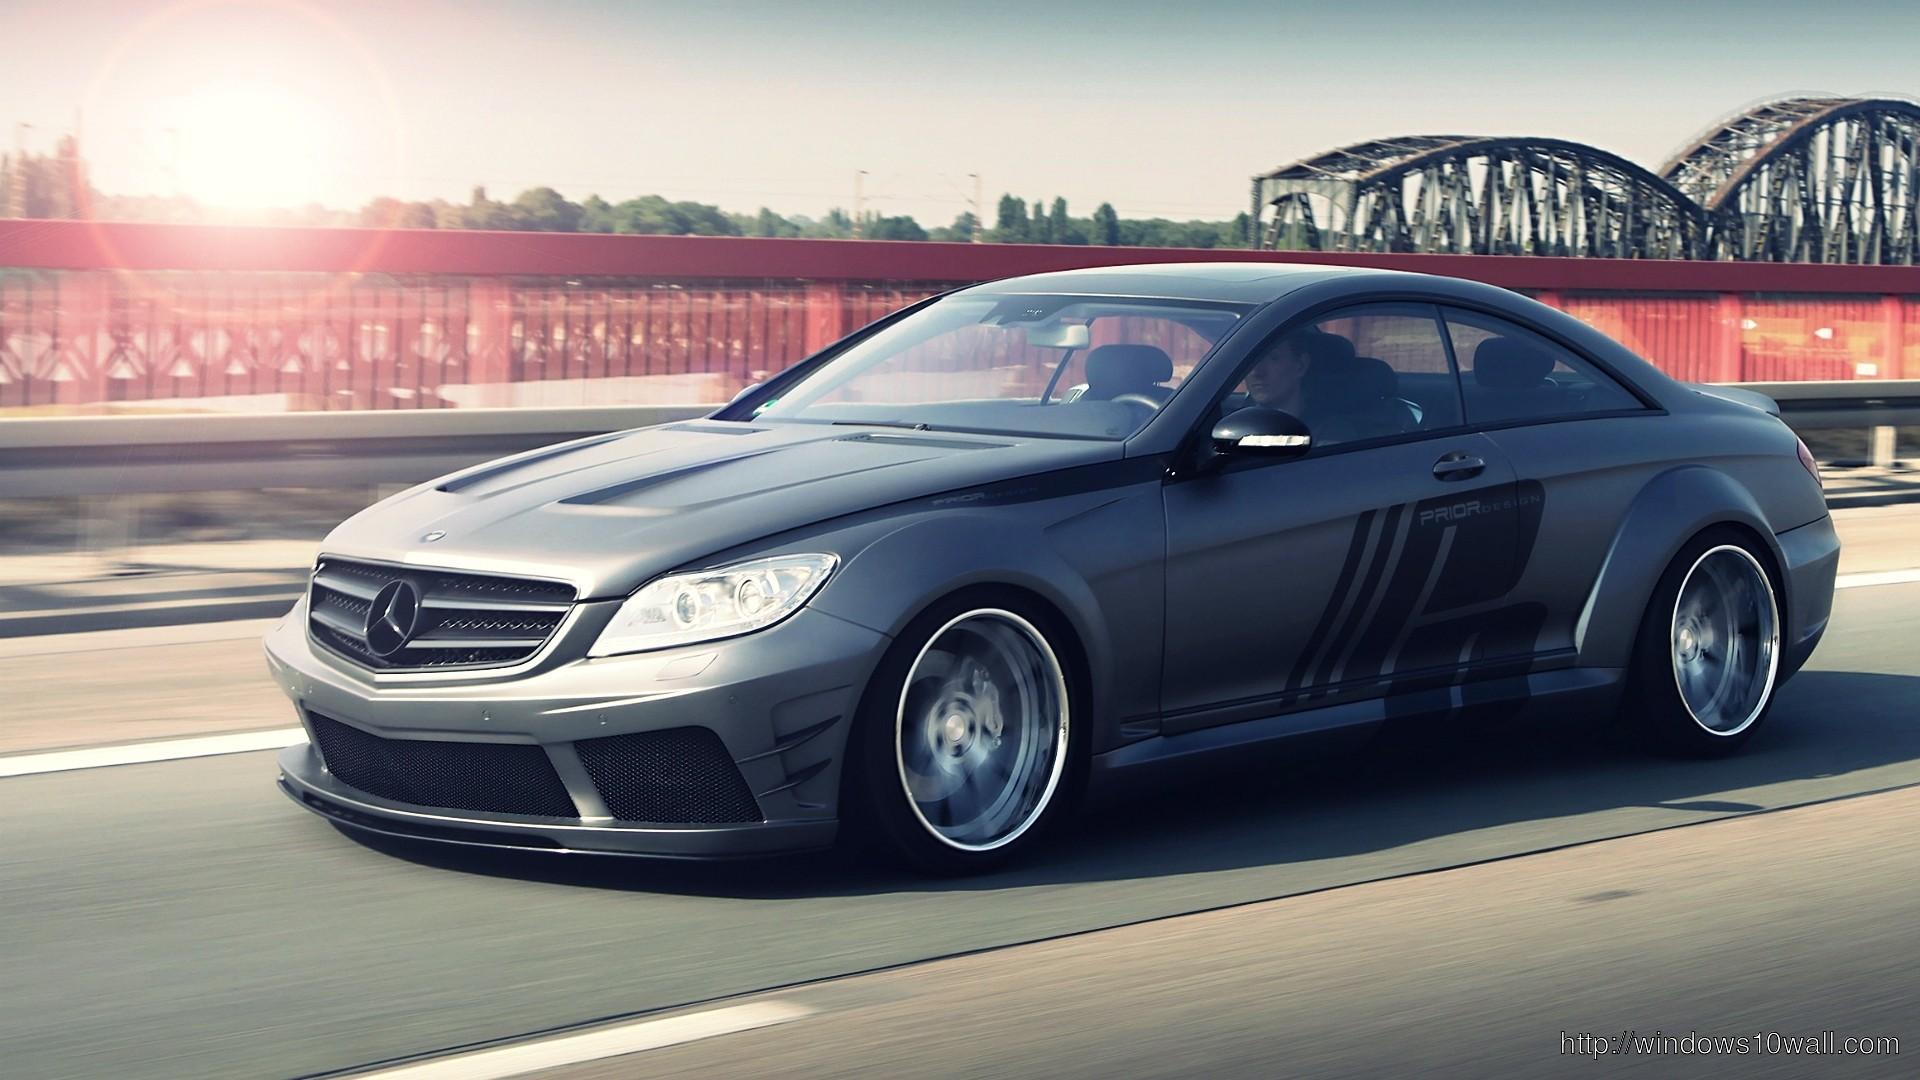 Mercedes AMG Matte Background Wallpaper - windows 10 ...